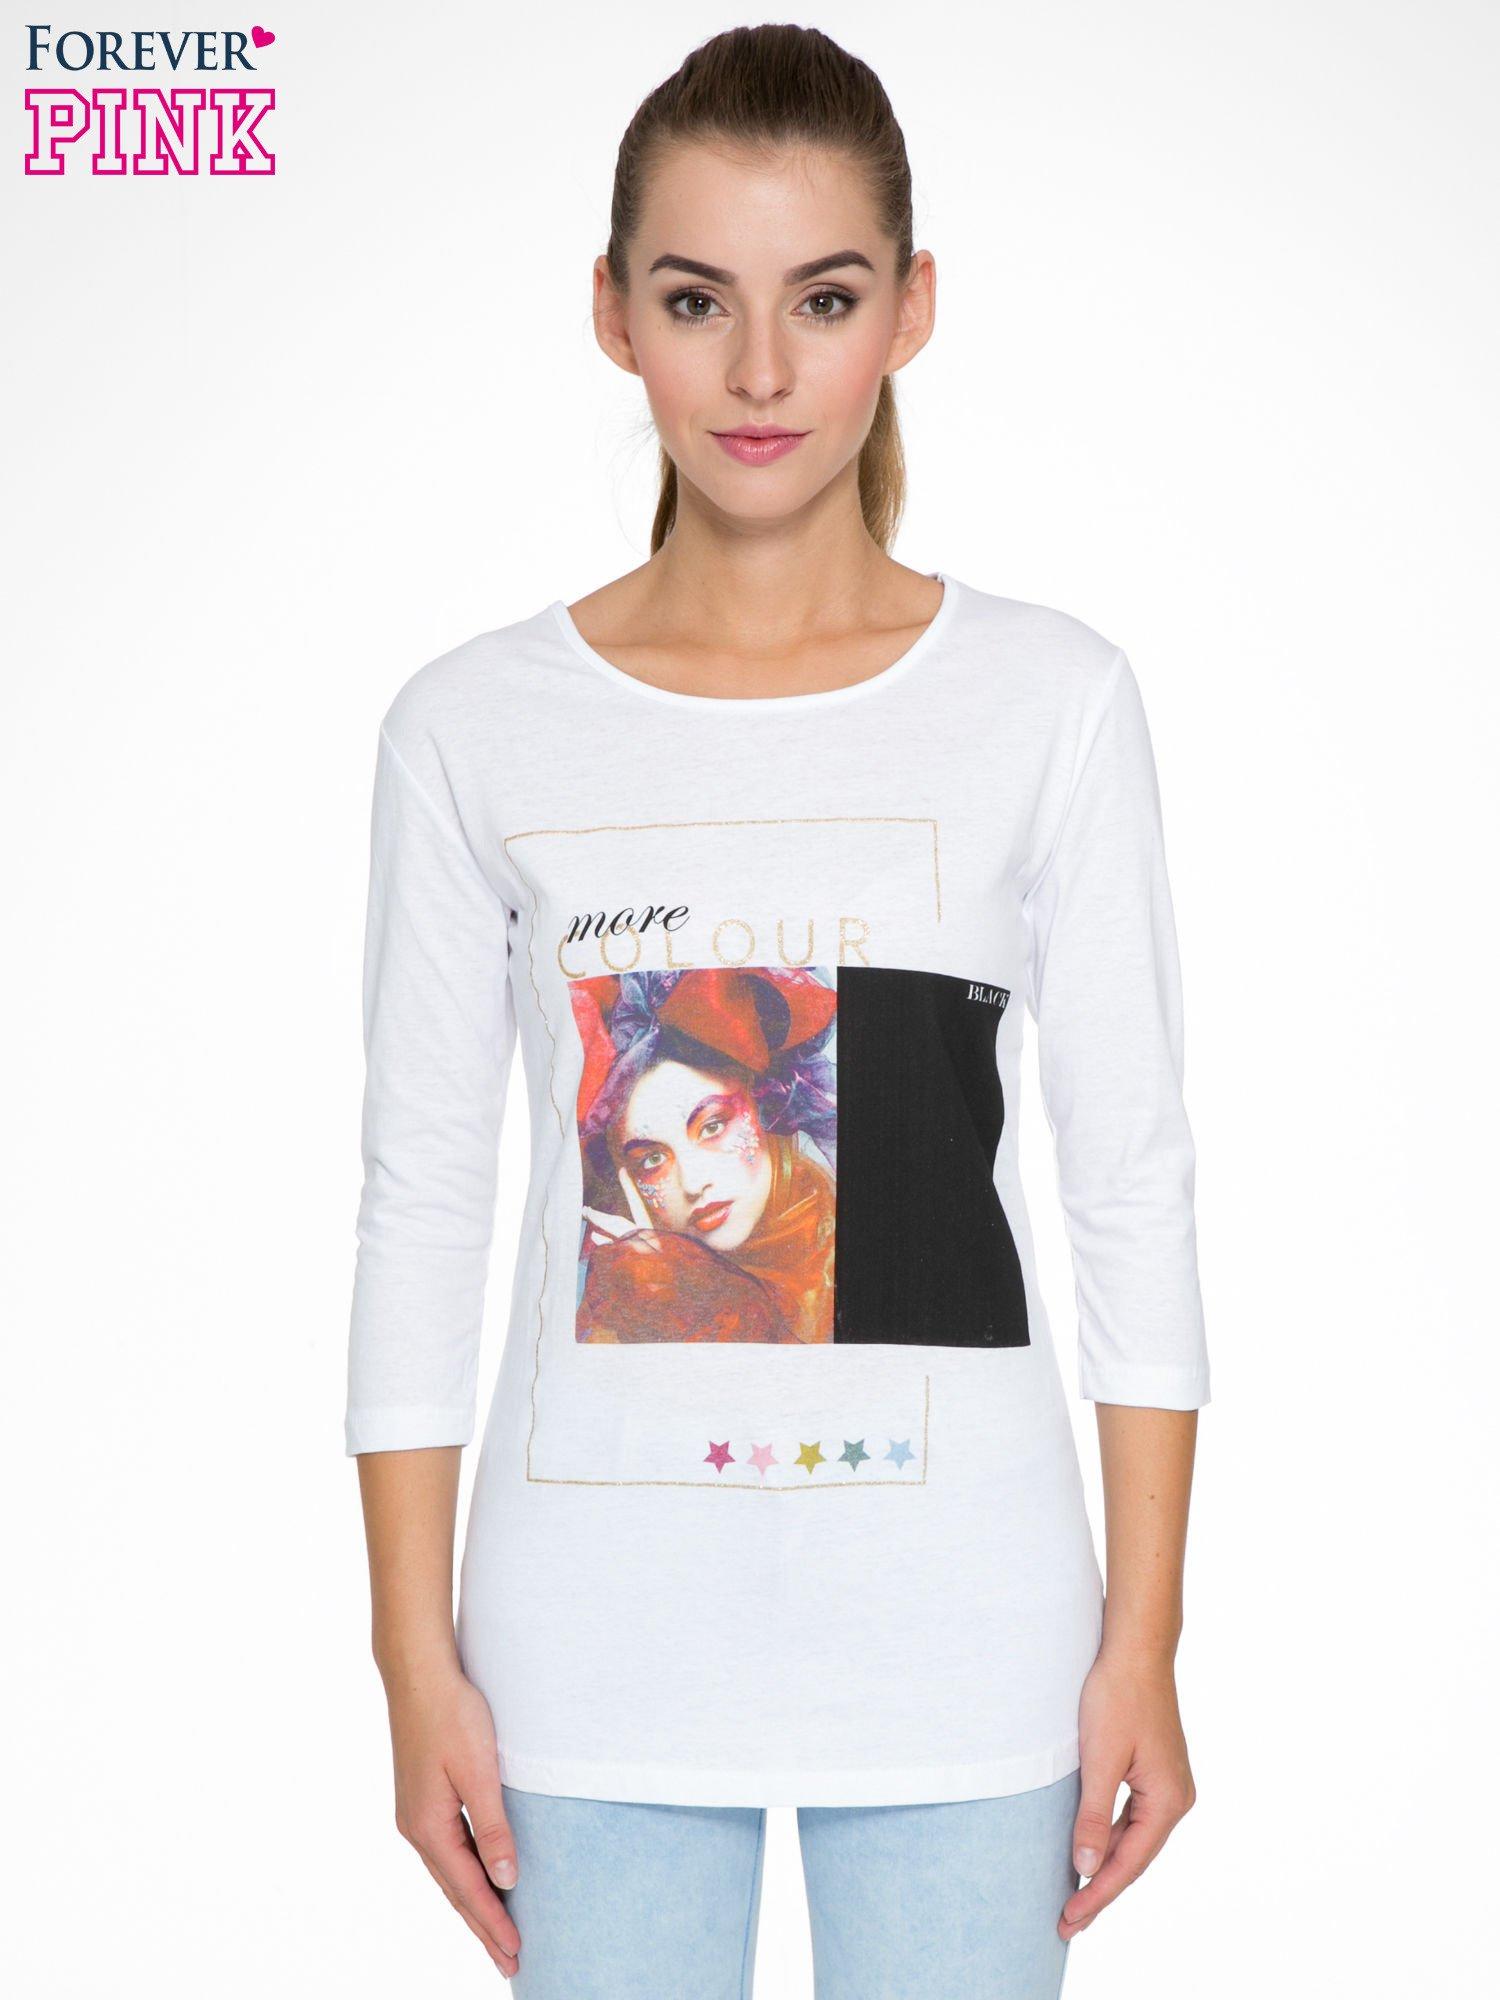 Biała bluzka z nadrukiem fashion i napisem MORE COLOUR                                  zdj.                                  1